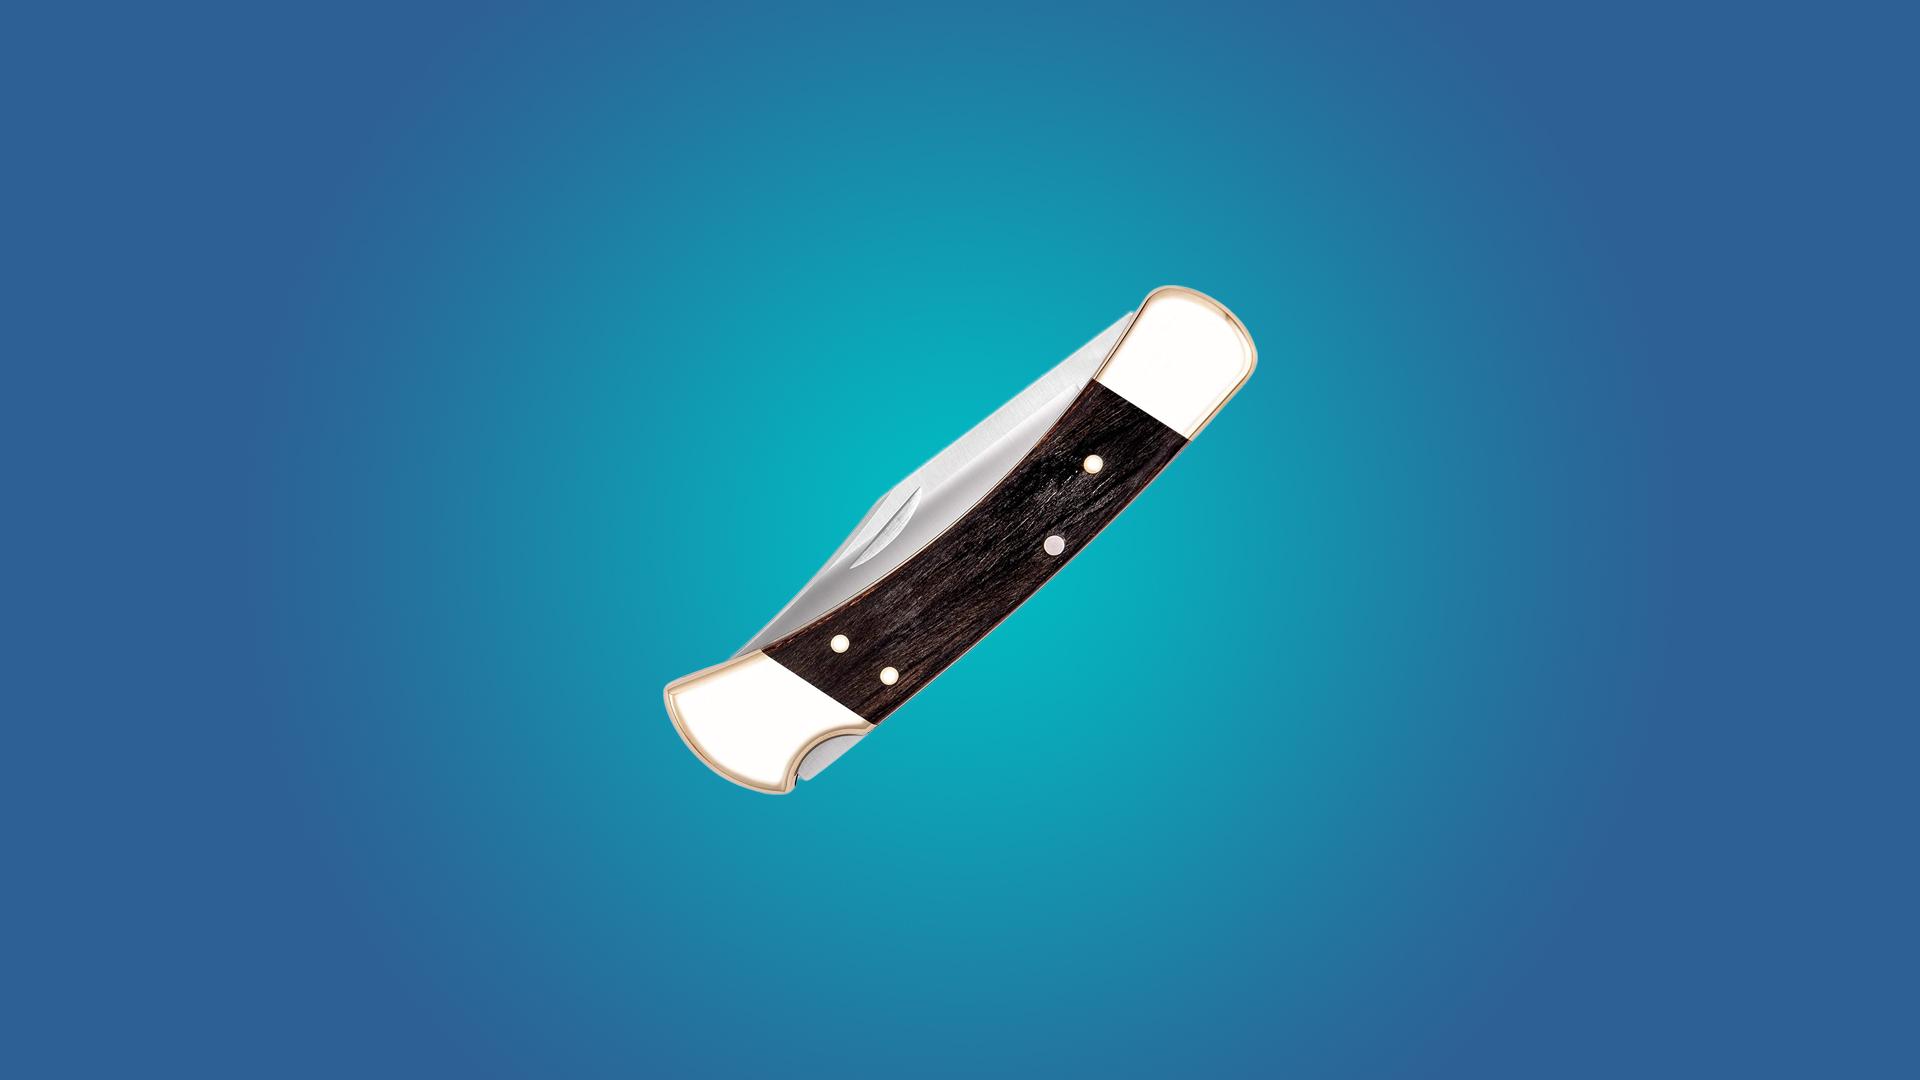 The Buck 110 Classic Folding Knife